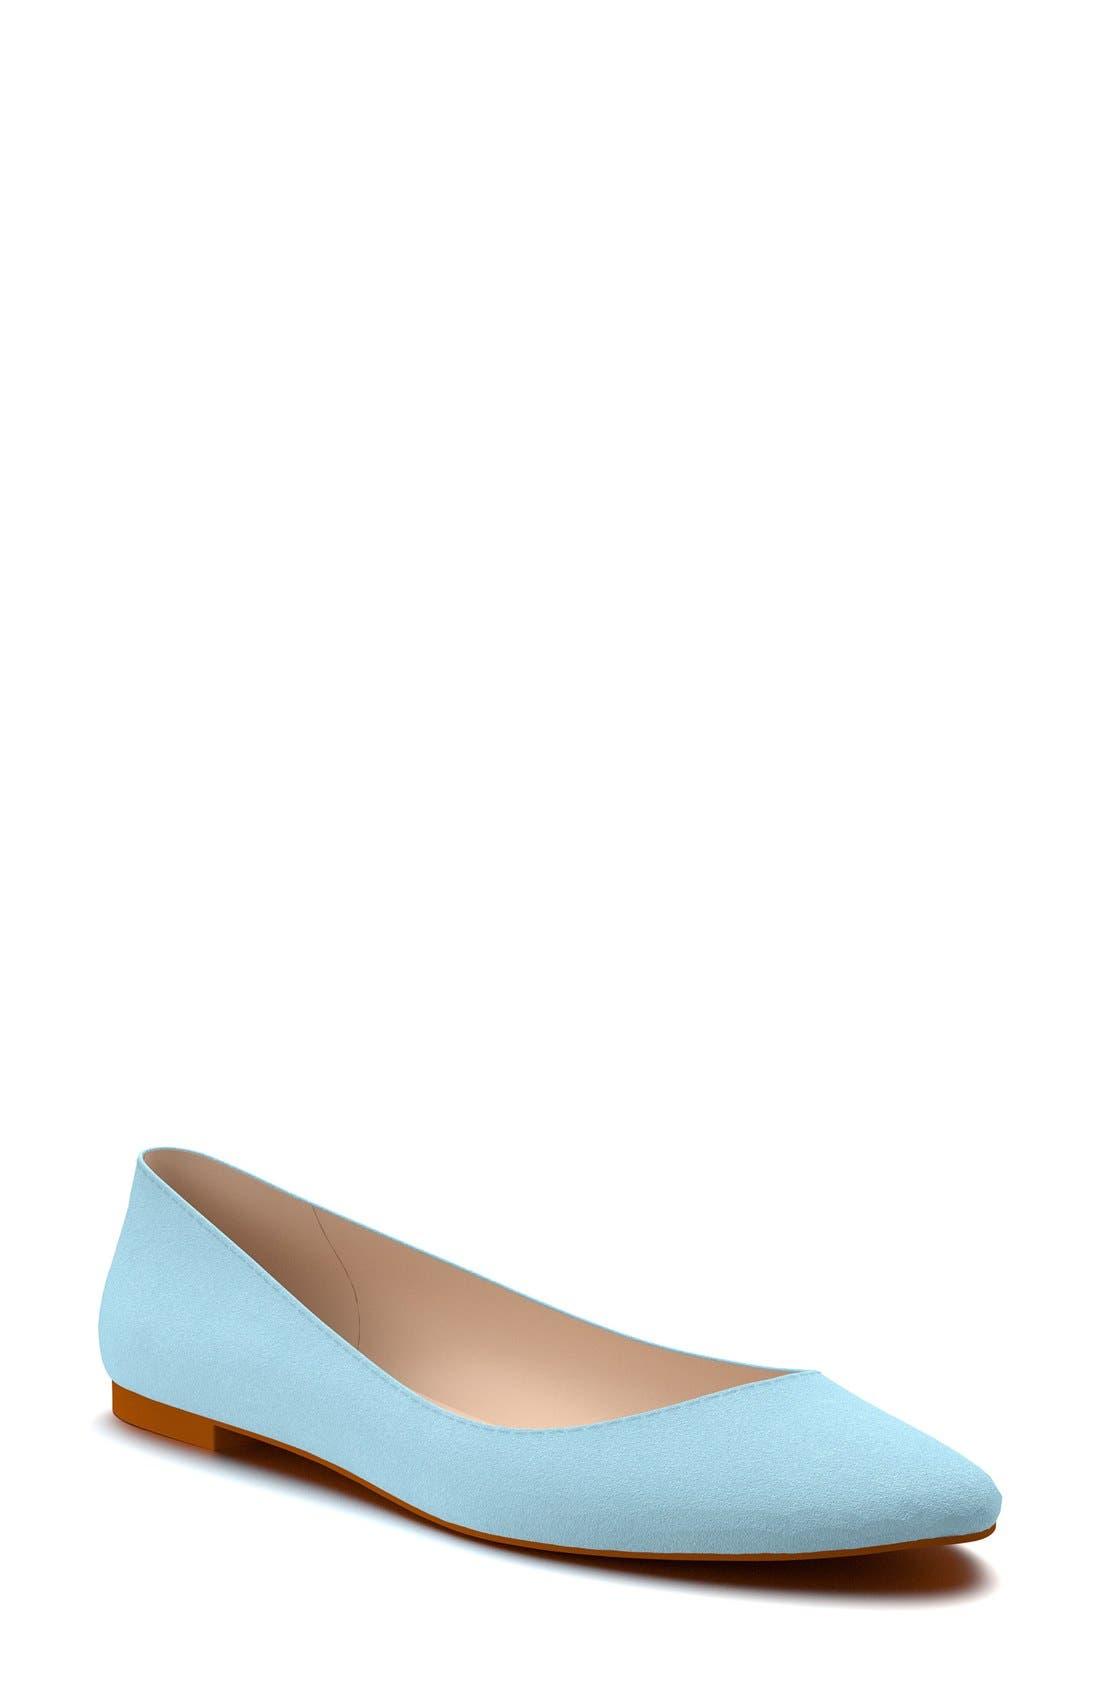 Main Image - Shoes of Prey Ballet Flat (Women)